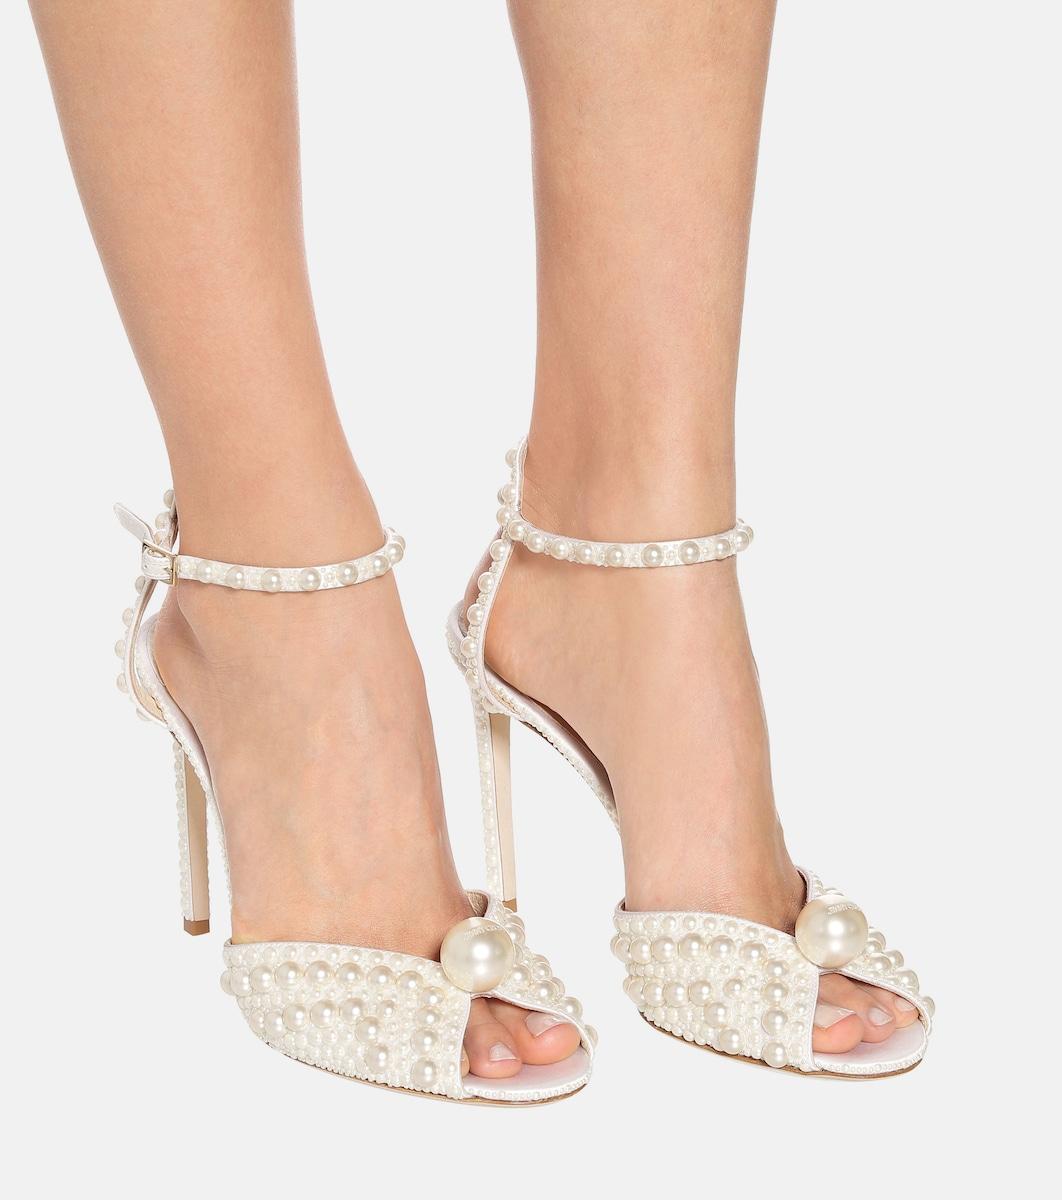 Sacora 100 faux pearl embellished sandals